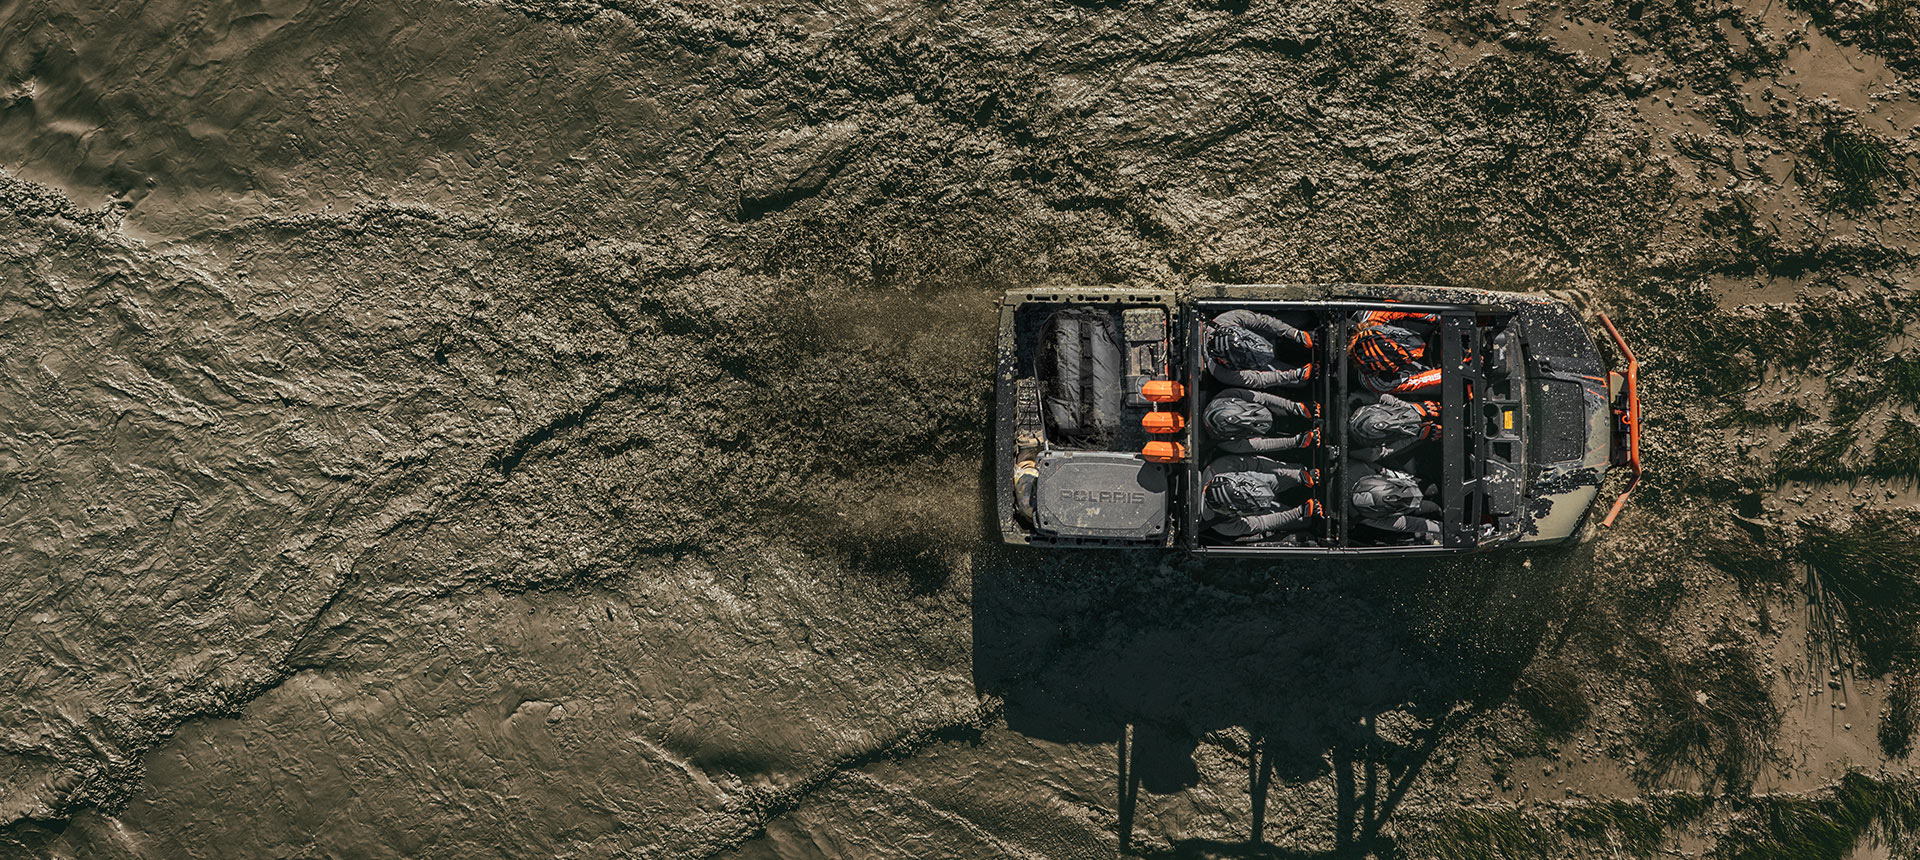 ranger-crew-xp-100-highlifter-media-4